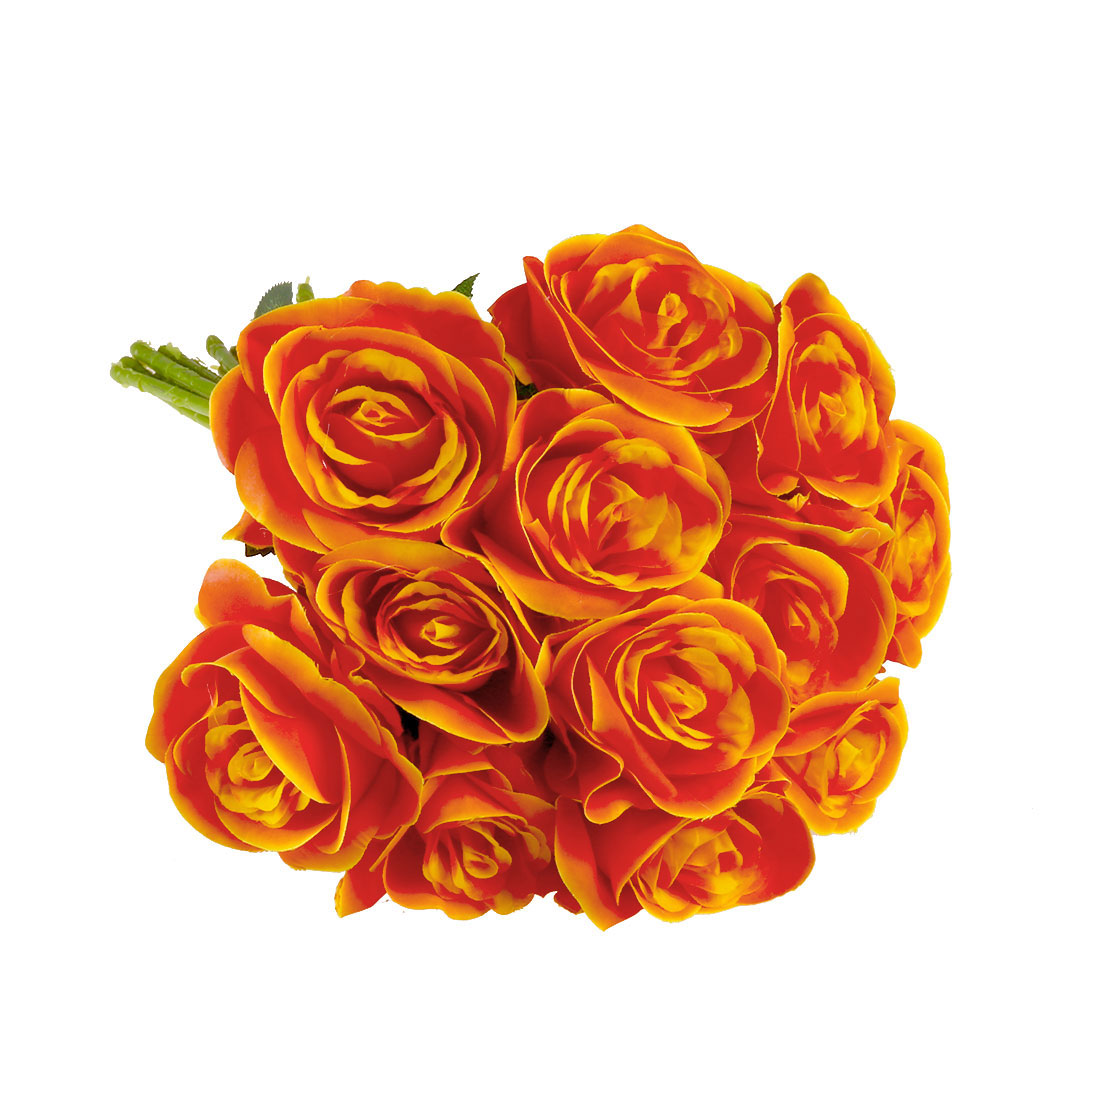 Artificial Silk Rose Flowers Rose Bouquet Wedding Home Decor Sunset Red 12pcs